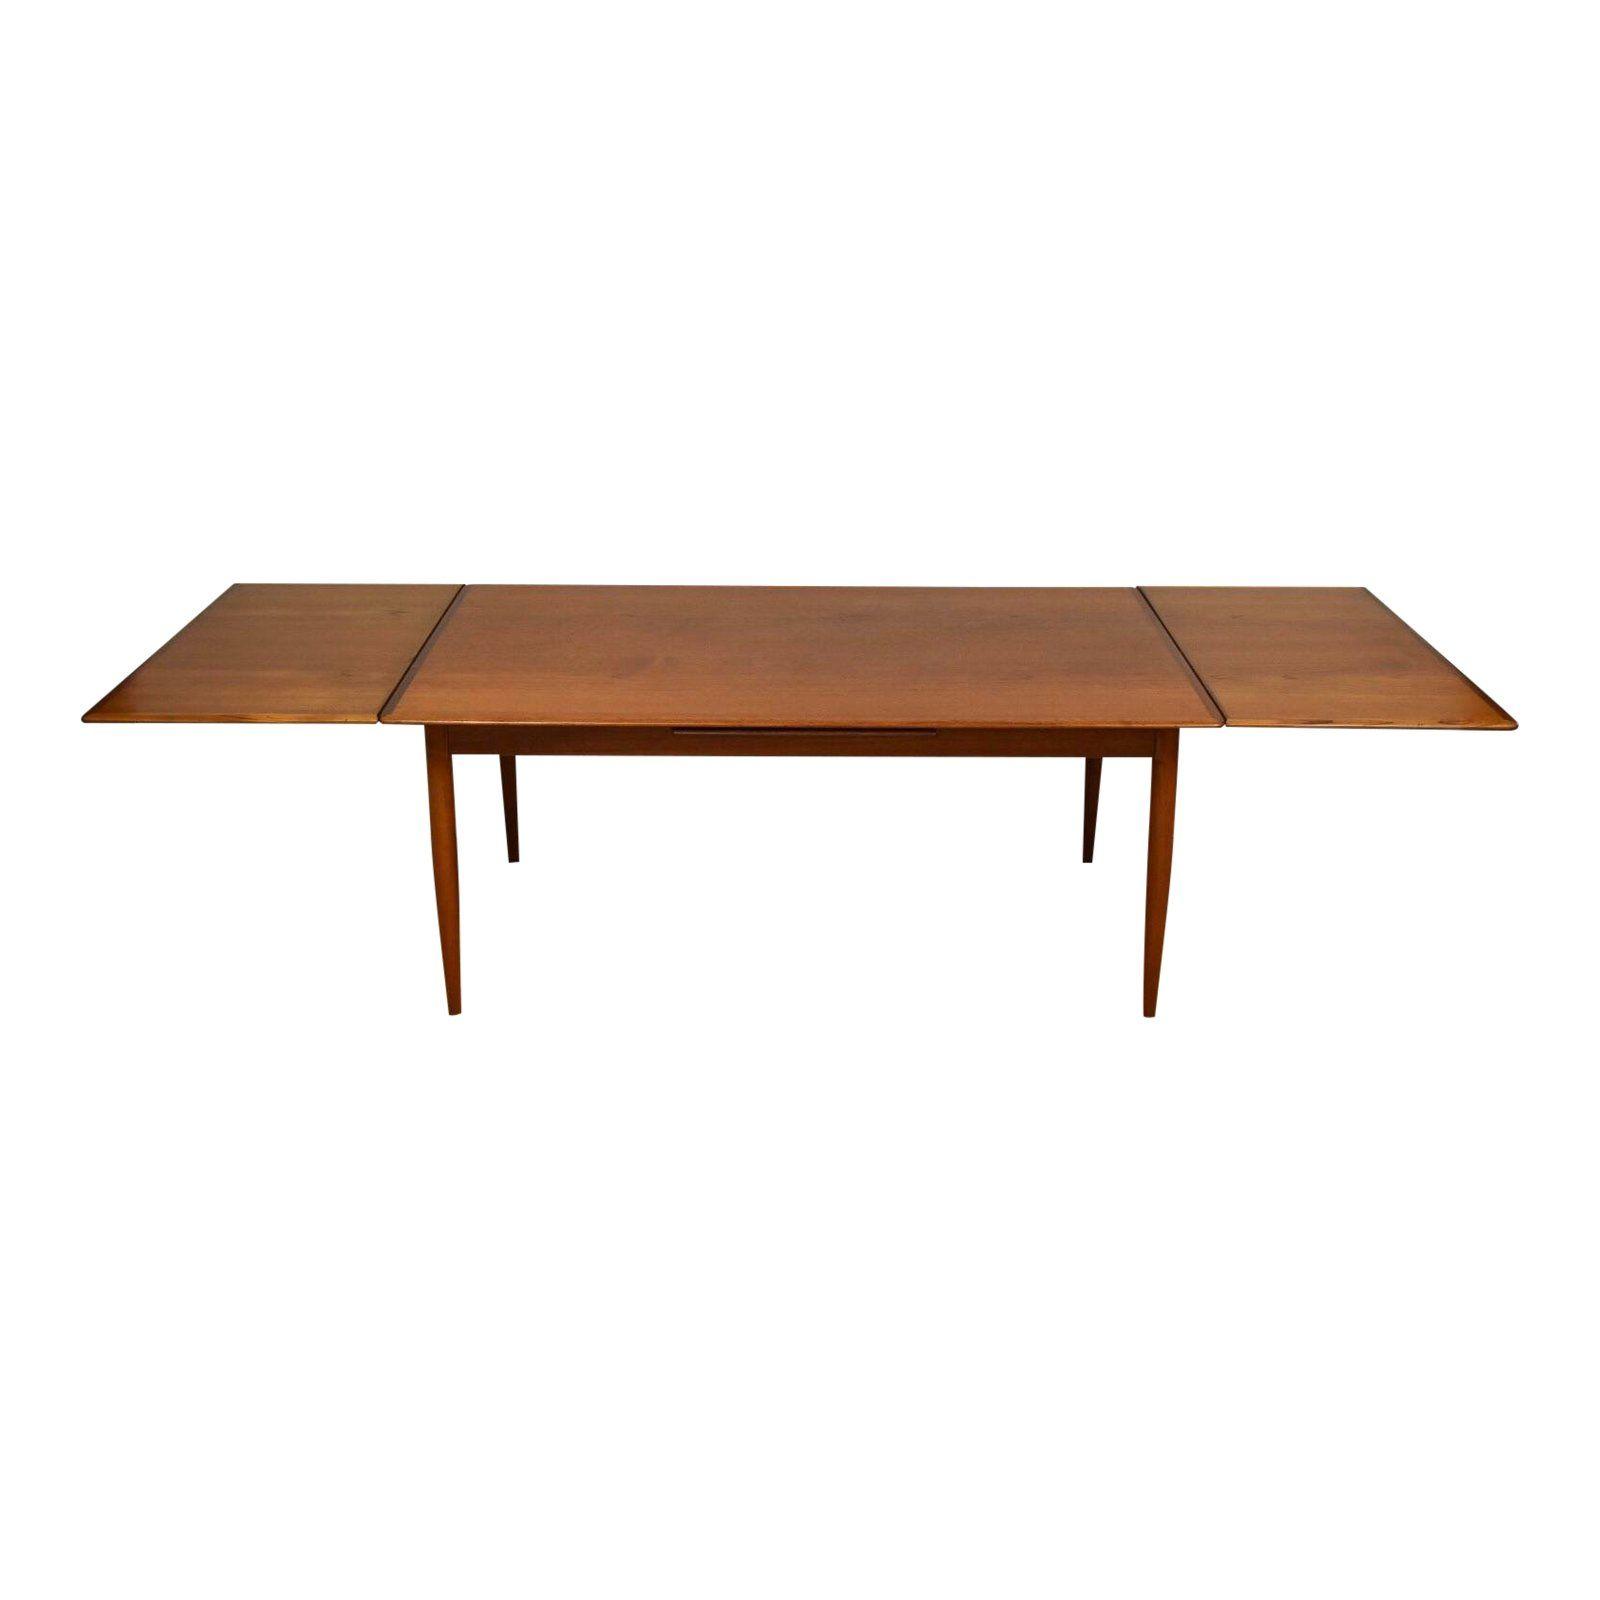 Danish Teak Draw Leaf Dining Table For Sale Dining Table Extendable Dining Table Dining